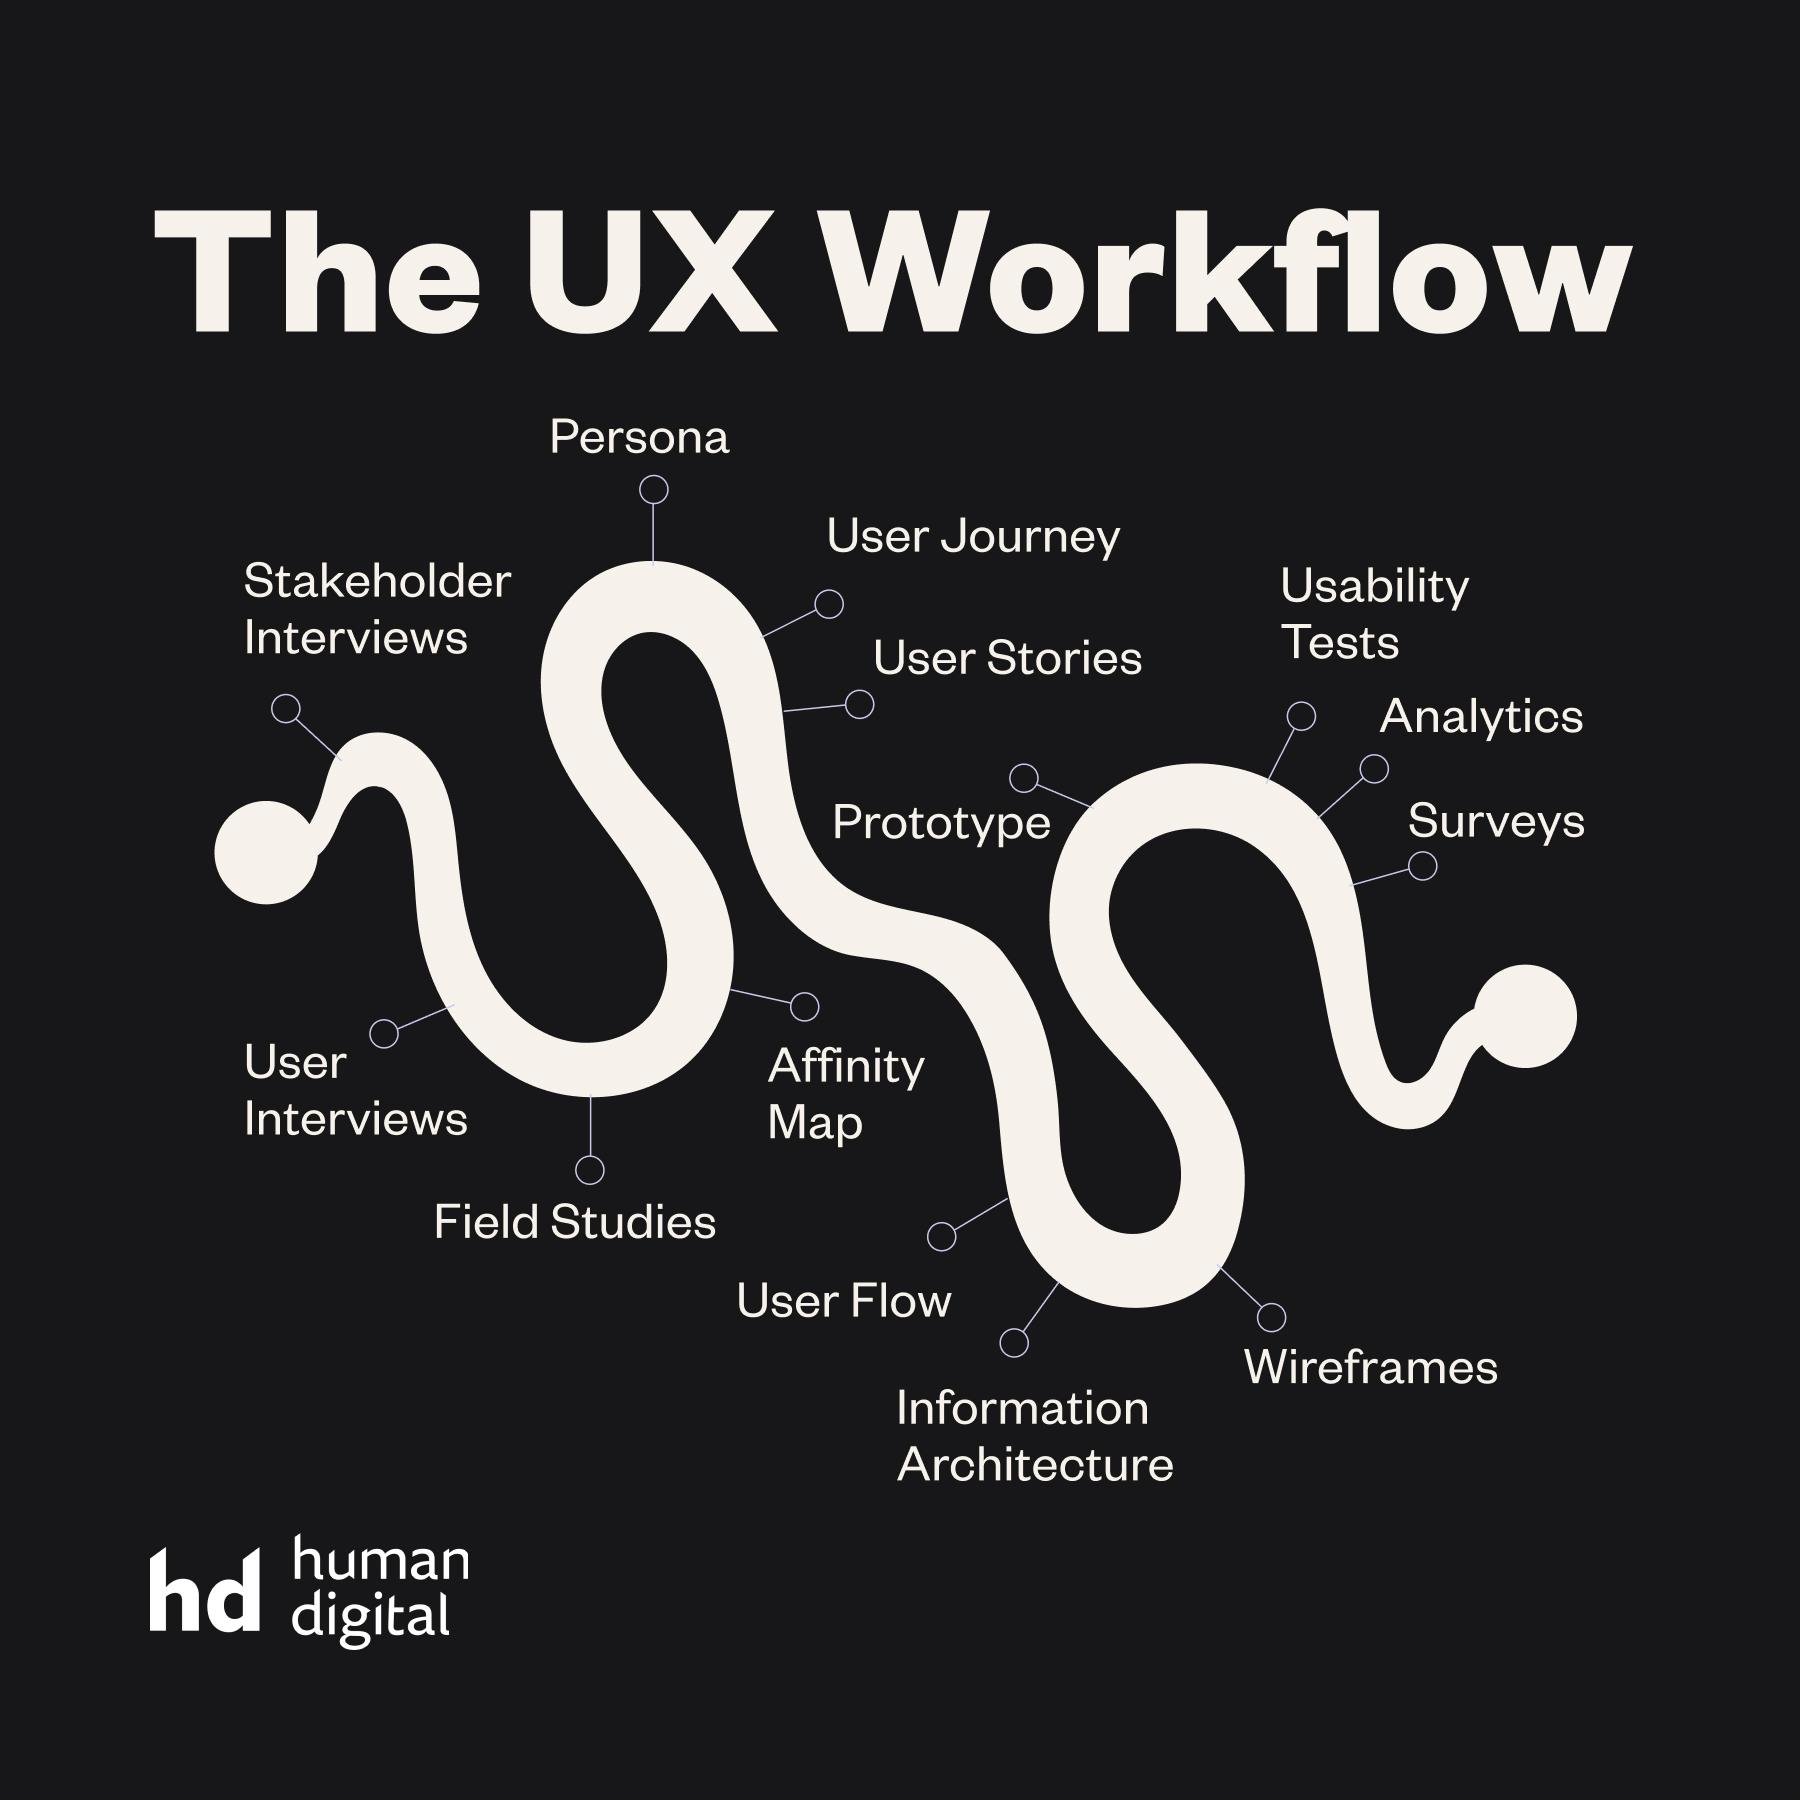 UX Workflow